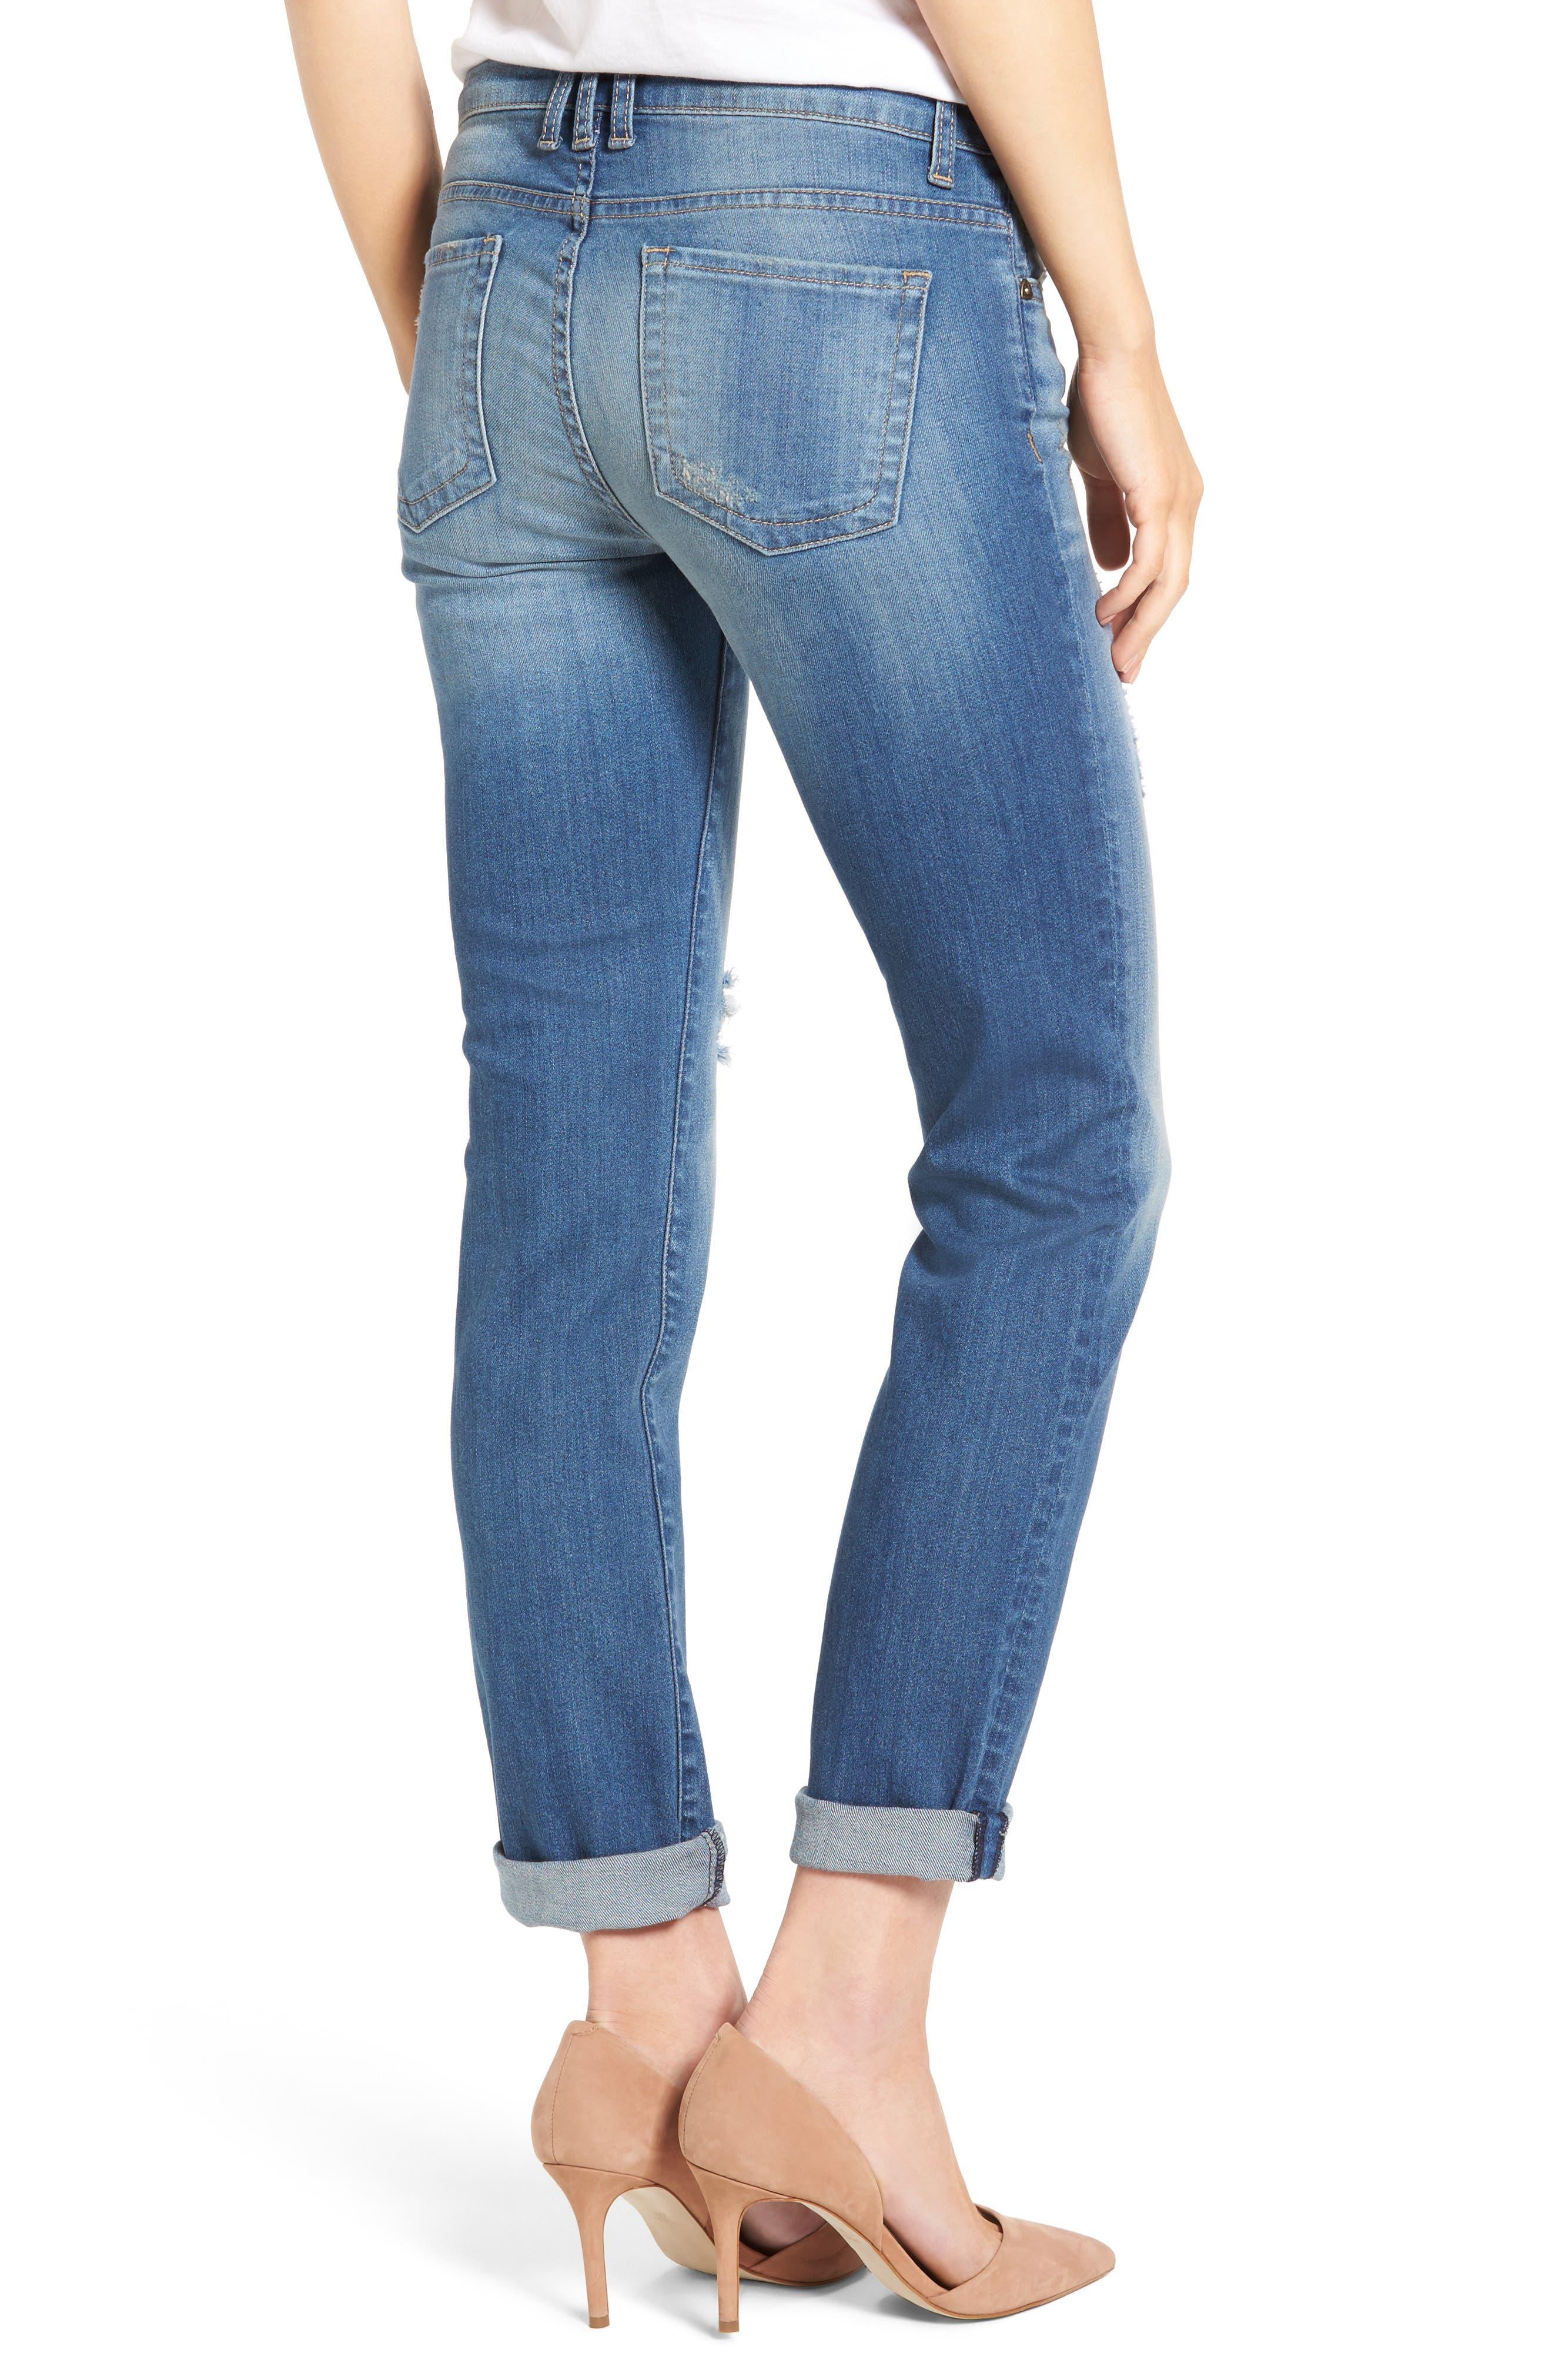 Alternate Image 2  - KUT from the Kloth Catherine Distressed Boyfriend Jeans (Fiery) (Regular & Petite)